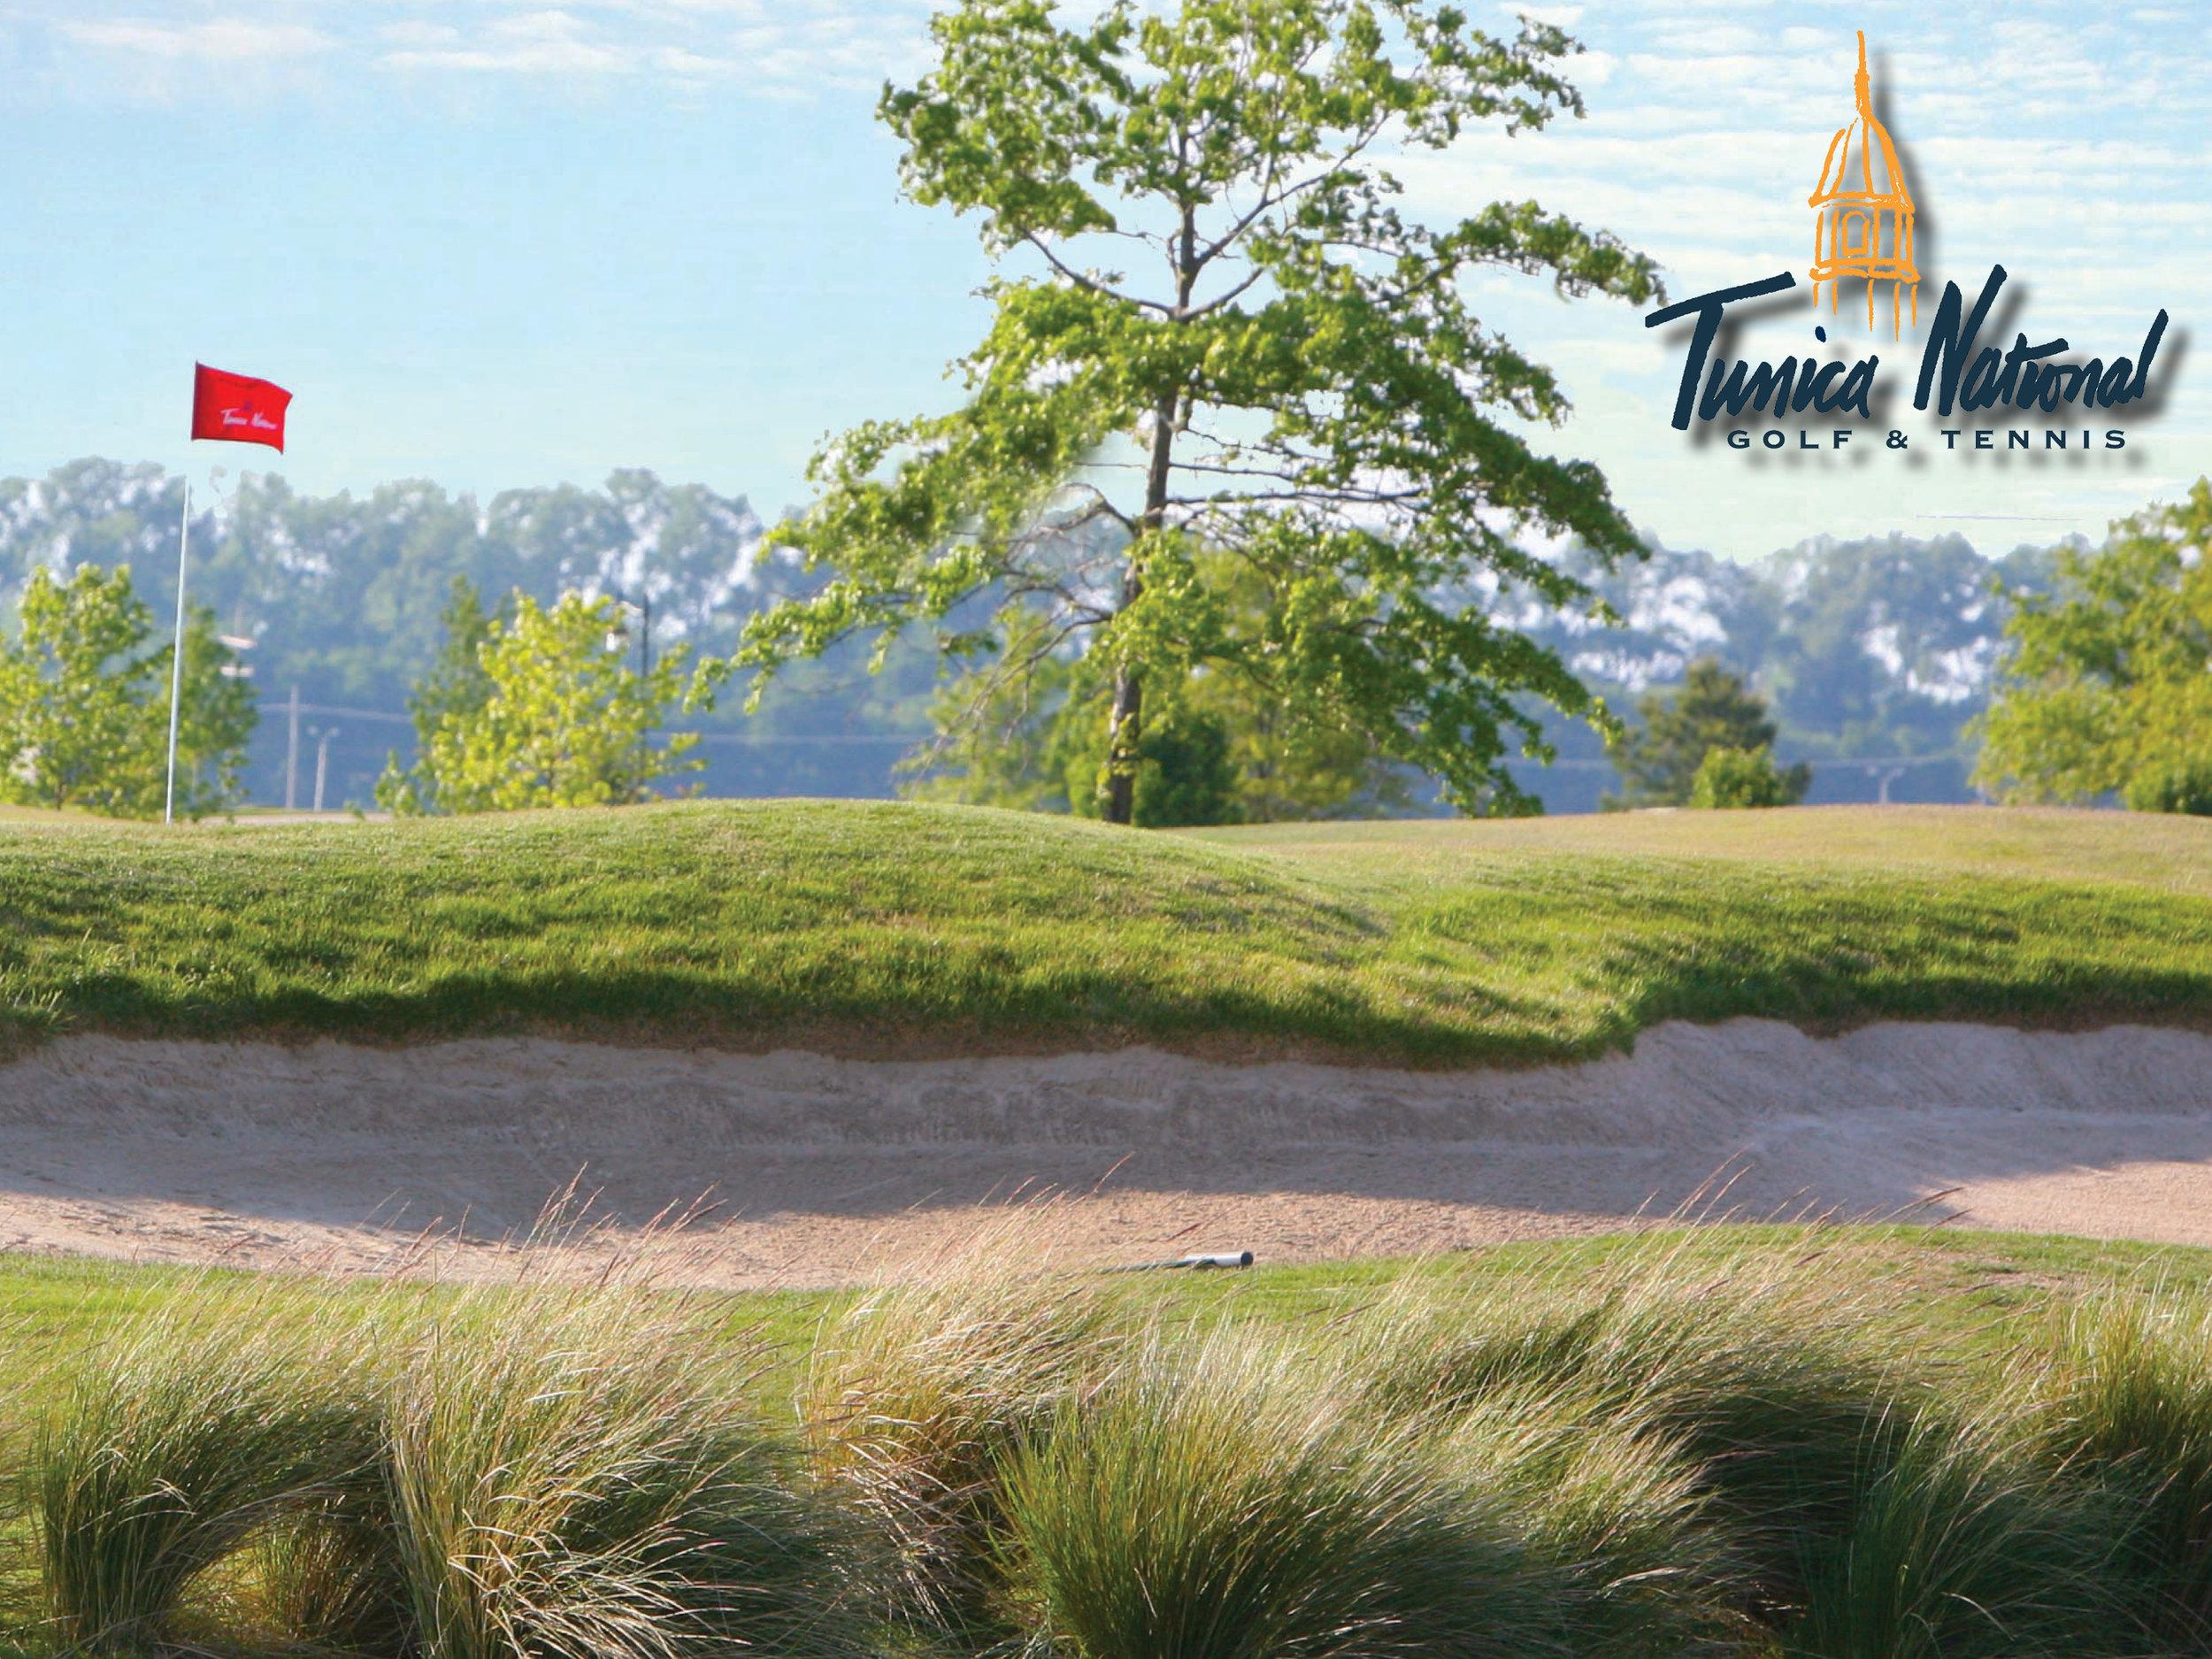 TUNICA RESORTS, MISSISSIPPI | SEASON KICKOFF - TUNICA NATIONAL GOLF & TENNISMarch 16th & 17th$220